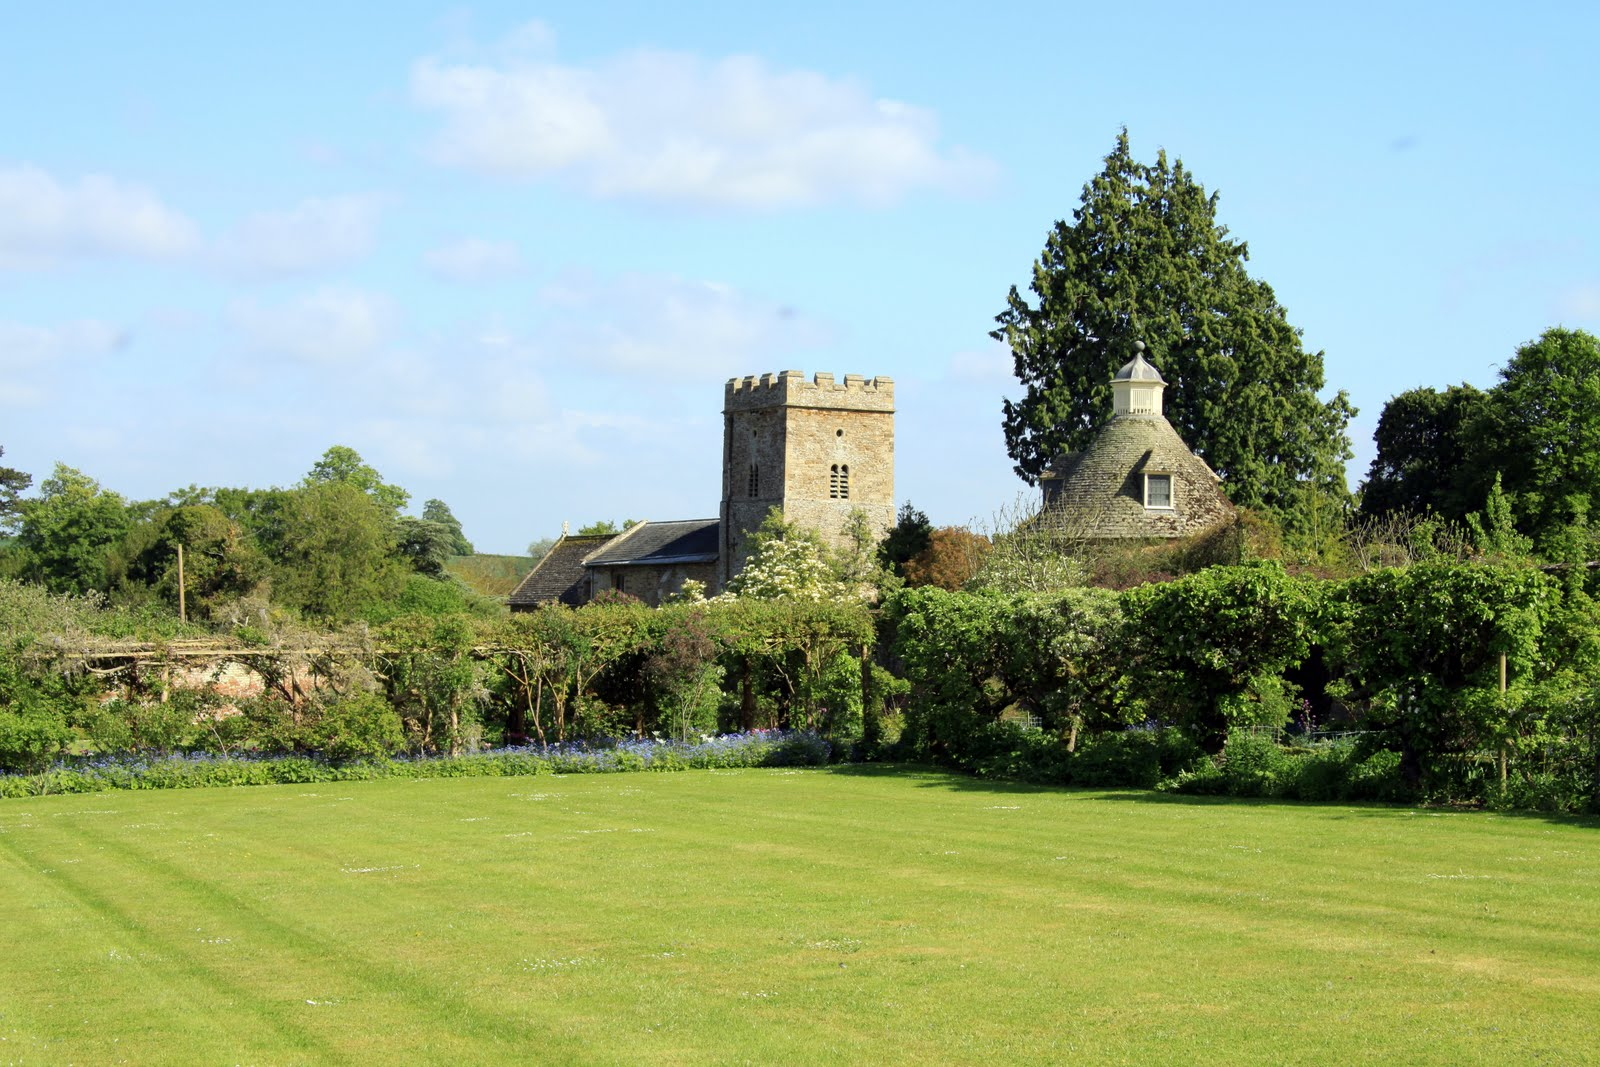 Marian Boswall Landscape Design And Garden Studio Pilgrimage To Rousham William Kentu0026#39;s ...